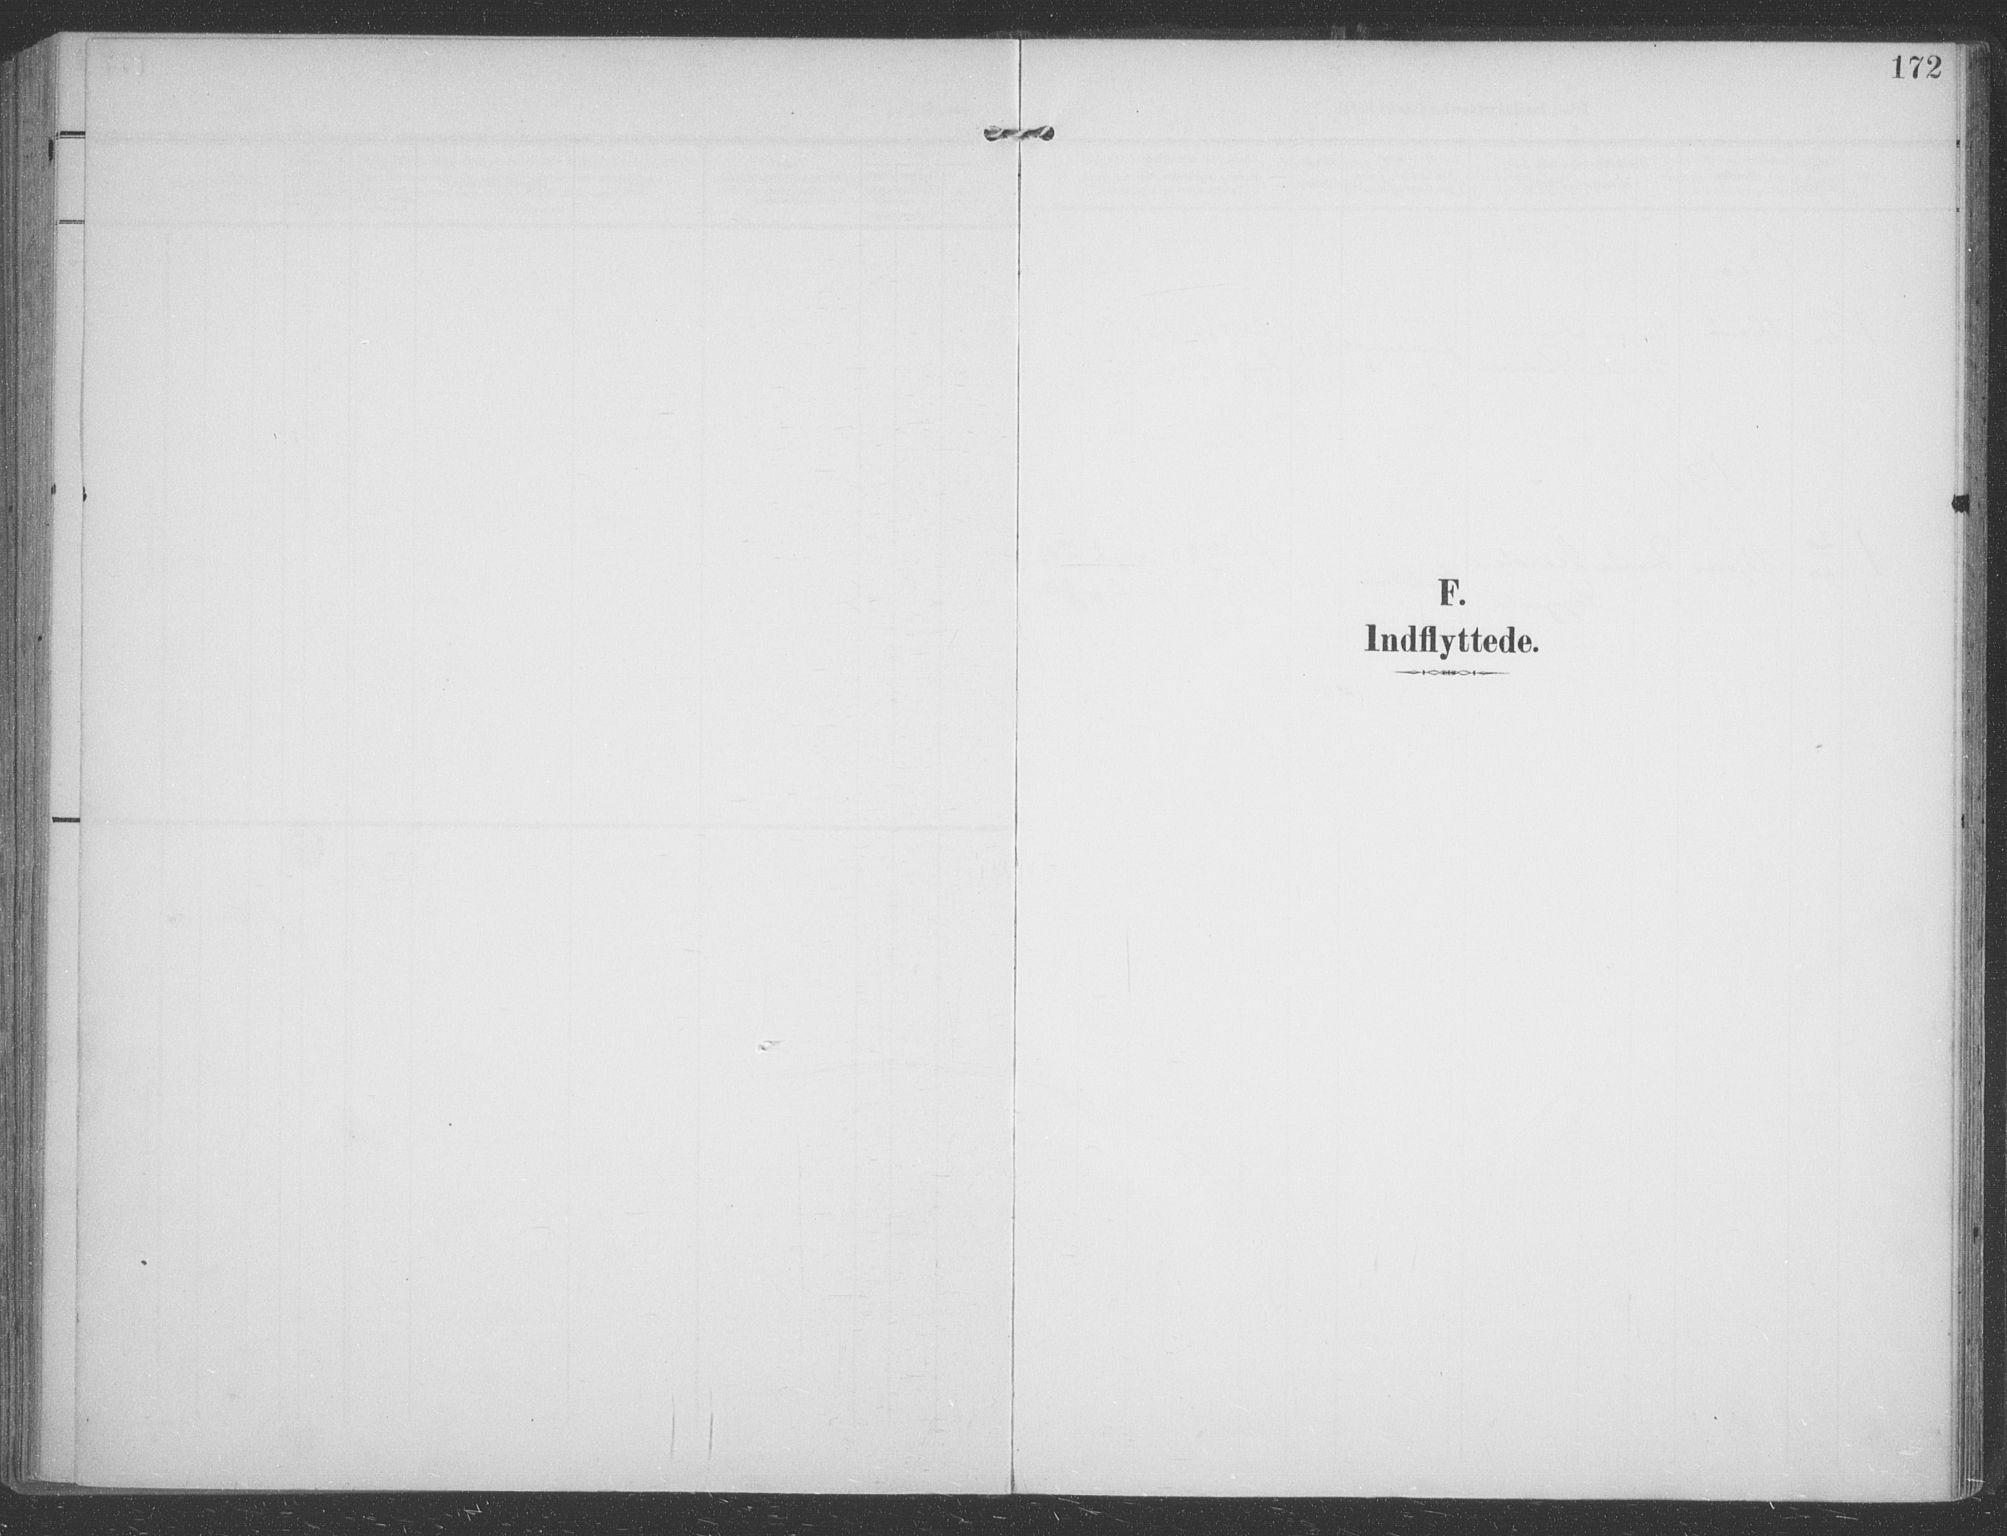 SATØ, Talvik sokneprestkontor, H/Ha/L0017kirke: Ministerialbok nr. 17, 1906-1915, s. 172